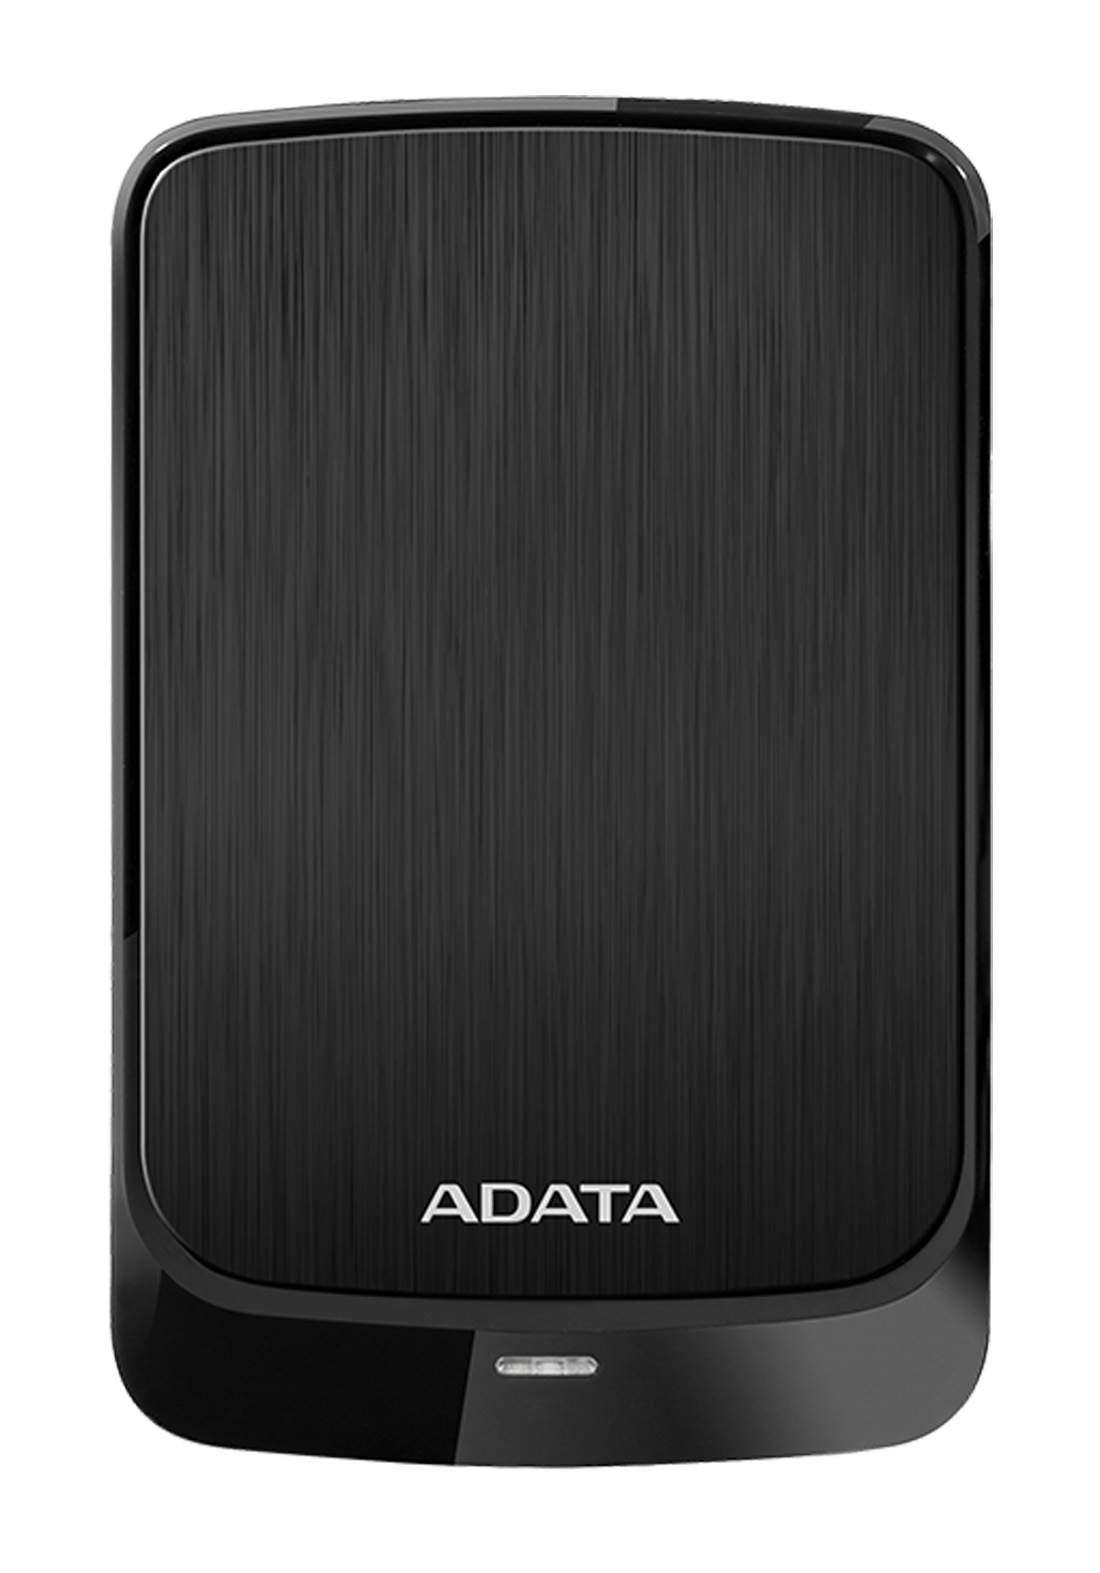 ADATA HD320 External Hard Drive 2TB - Black هارد خارجي